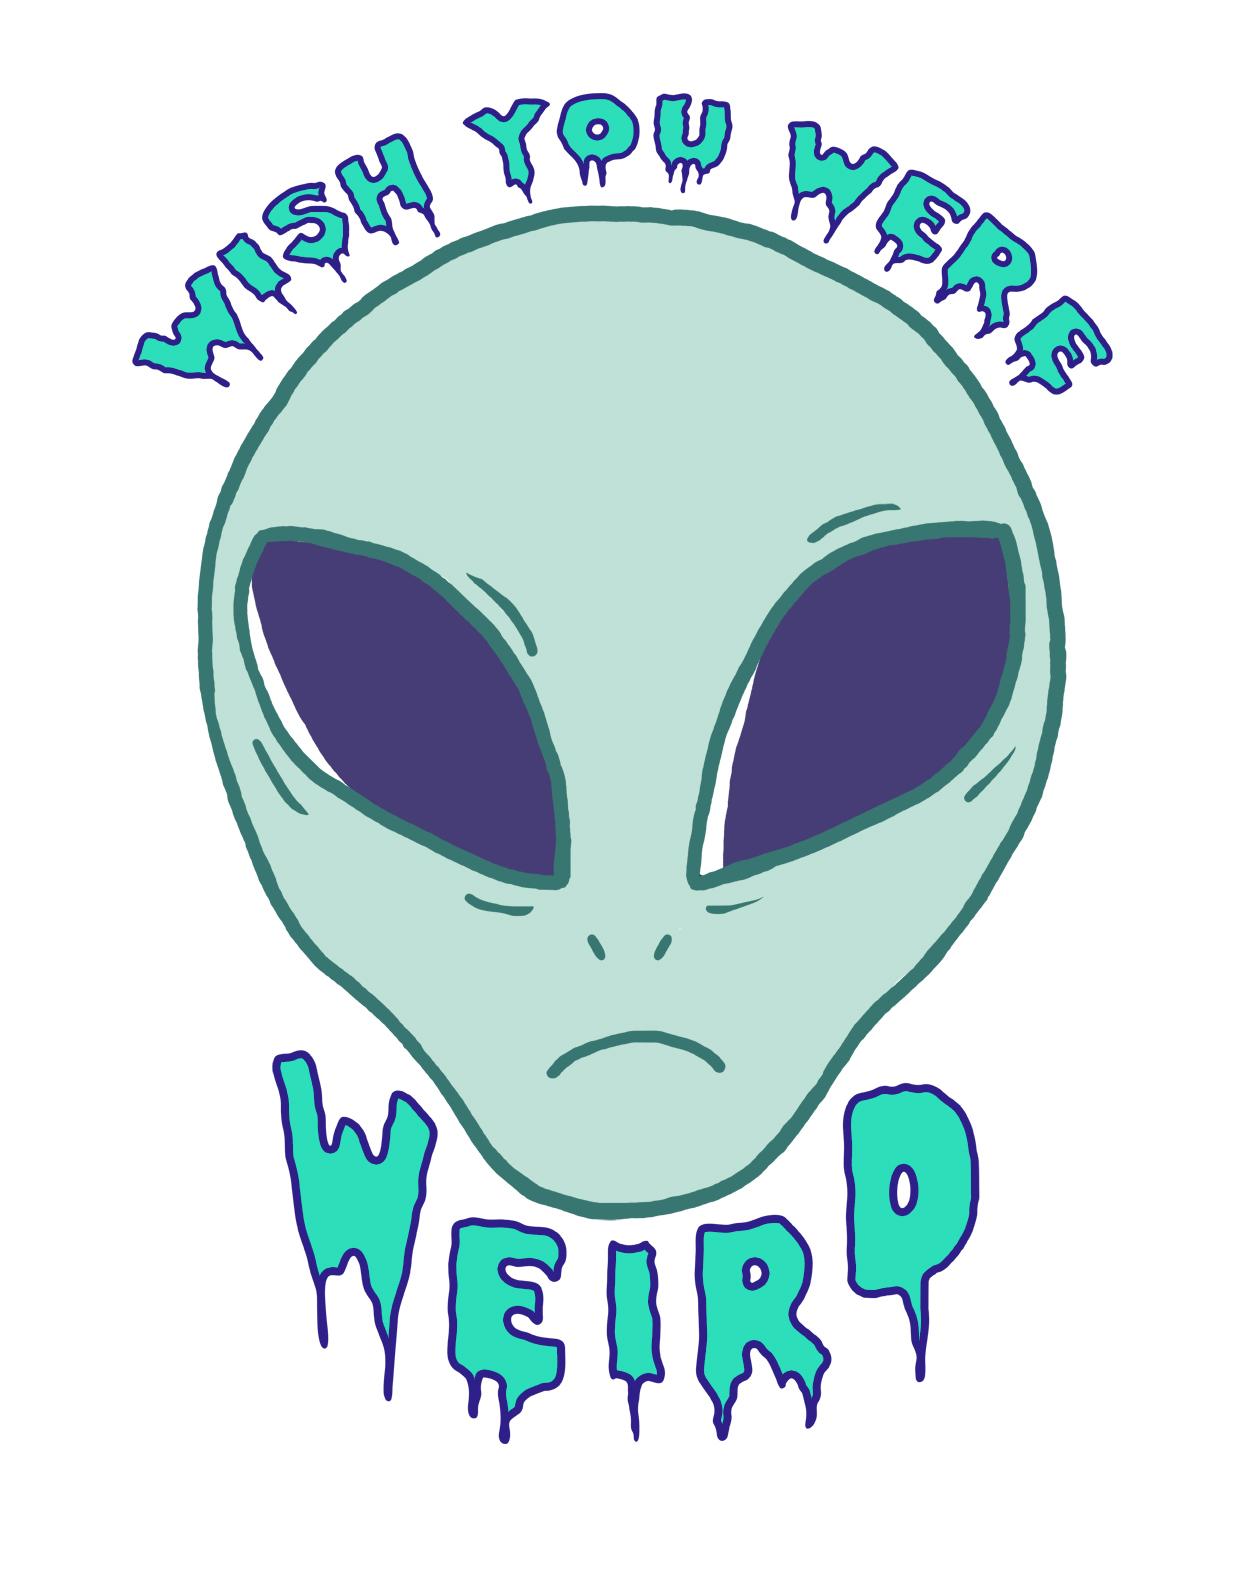 alien_graphic.jpg